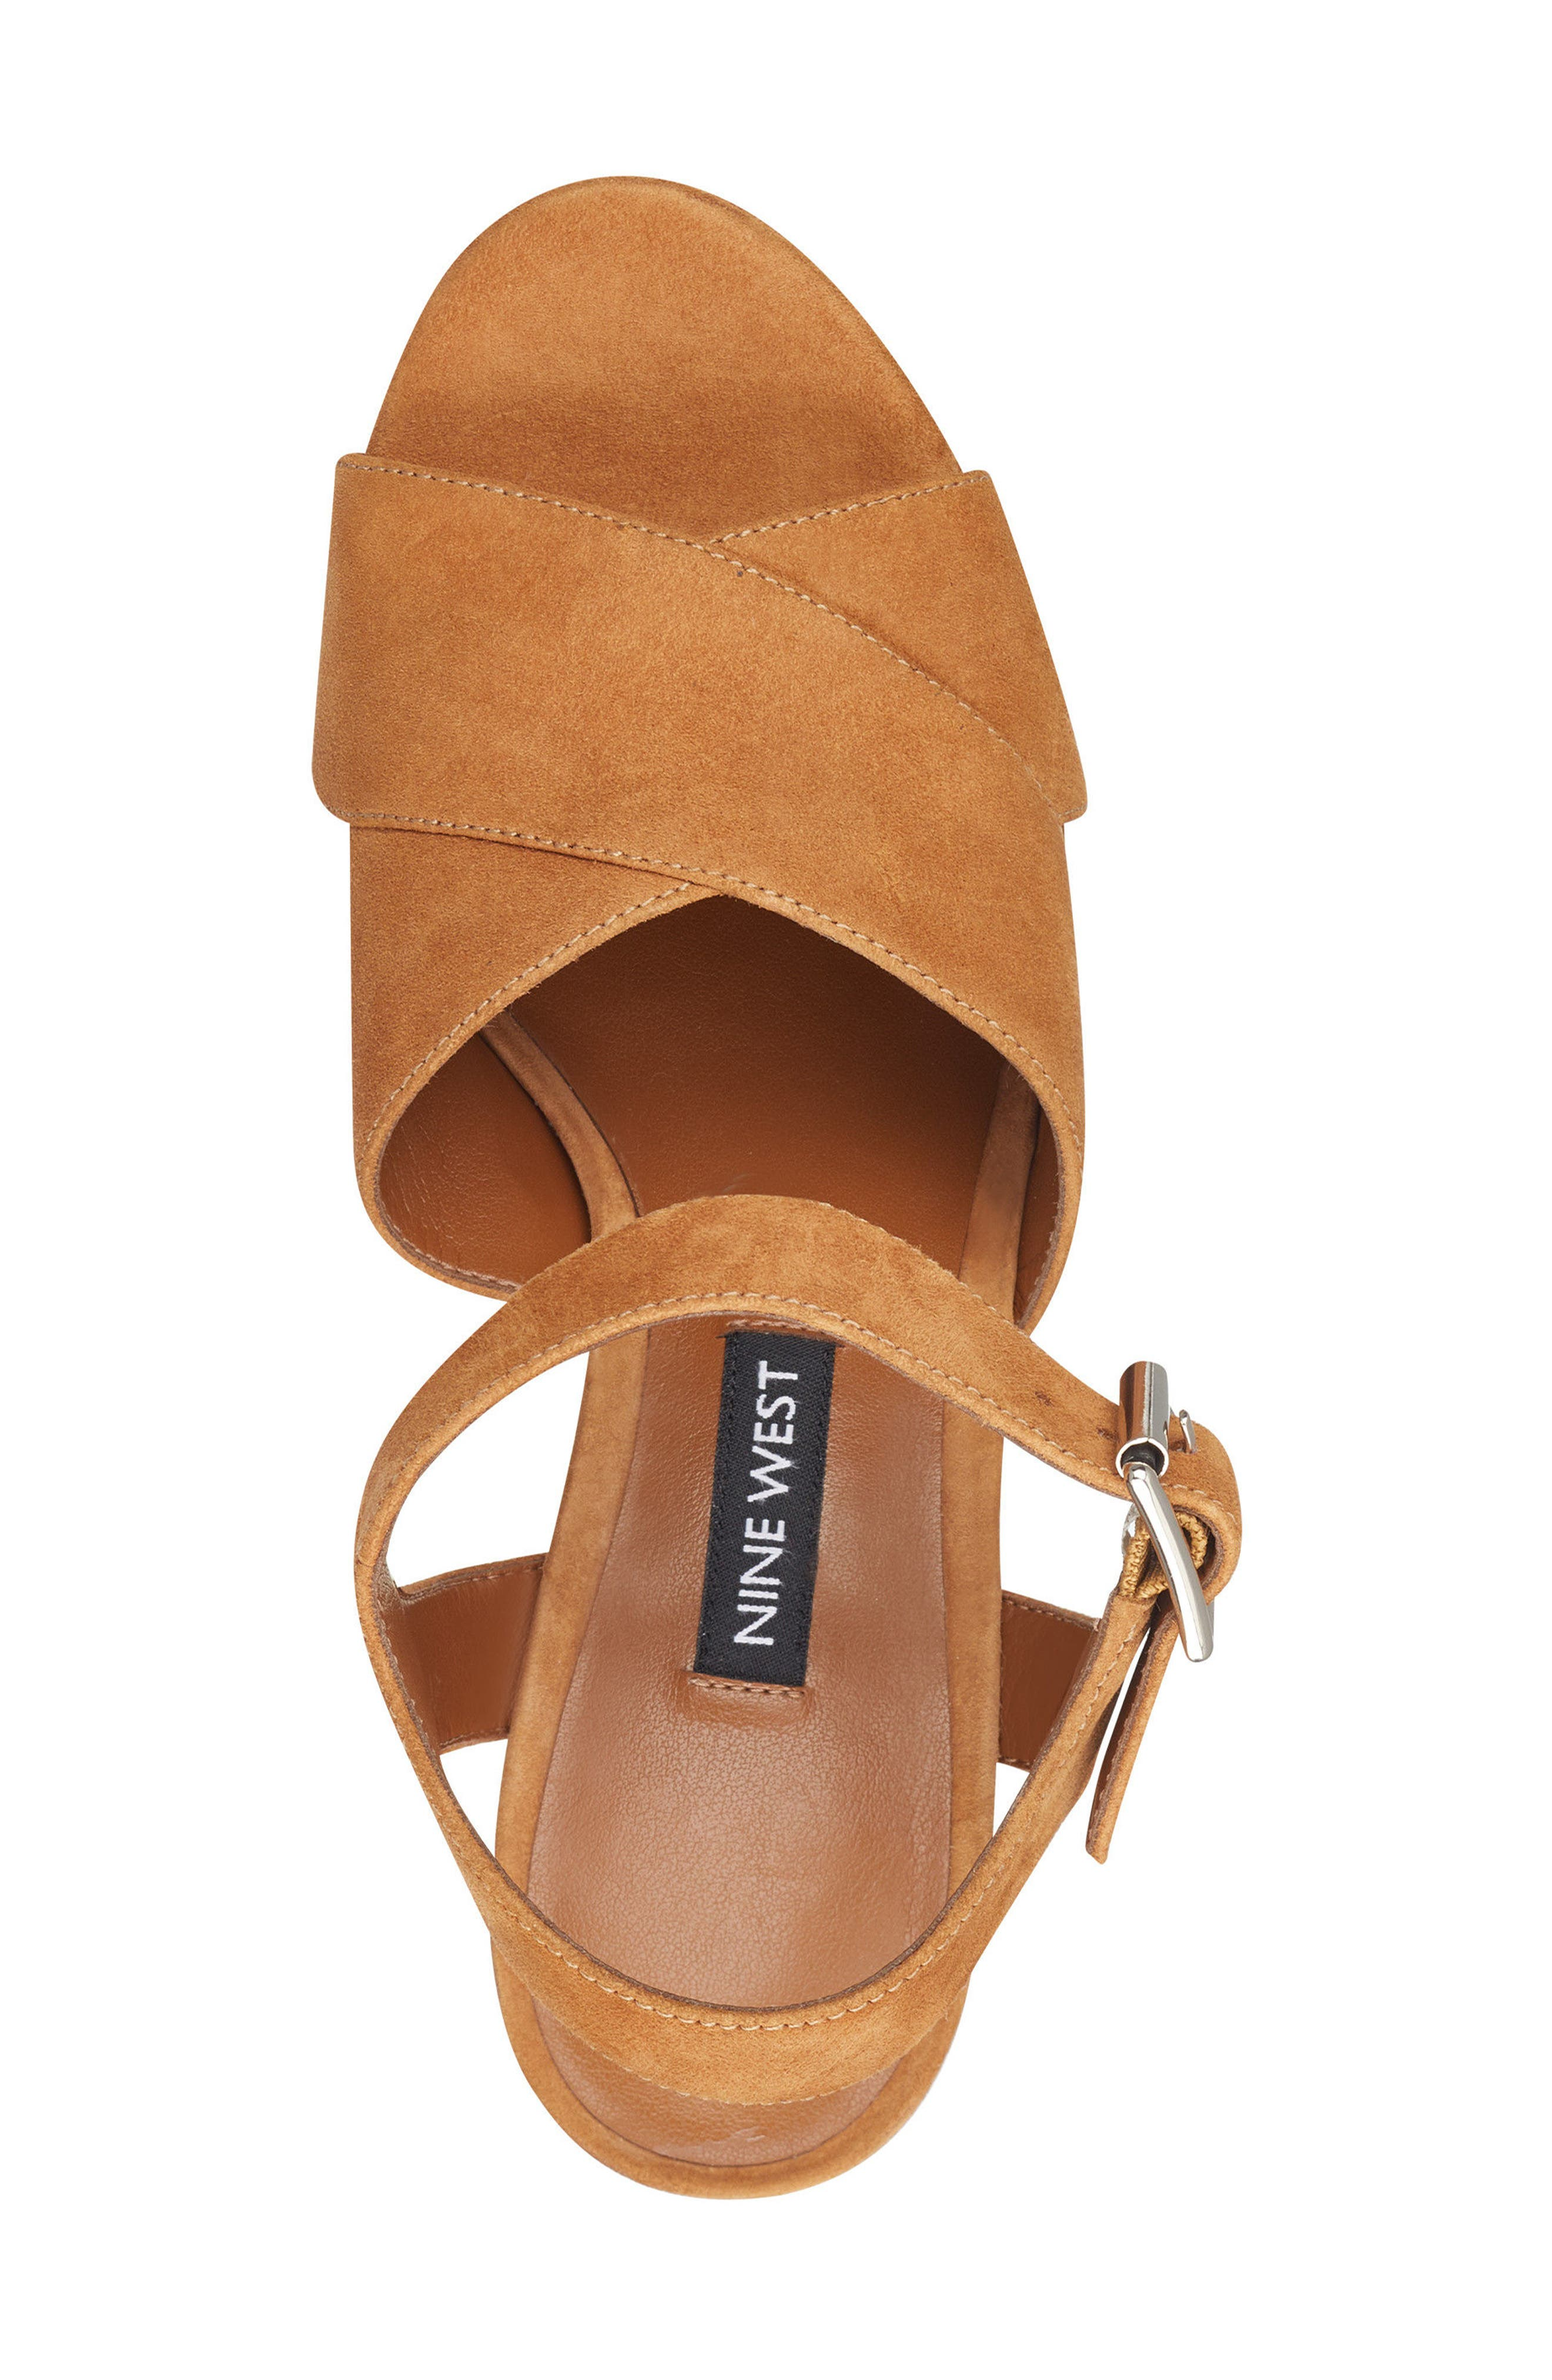 Jimar Platform Sandal,                             Alternate thumbnail 5, color,                             DARK NATURAL SUEDE